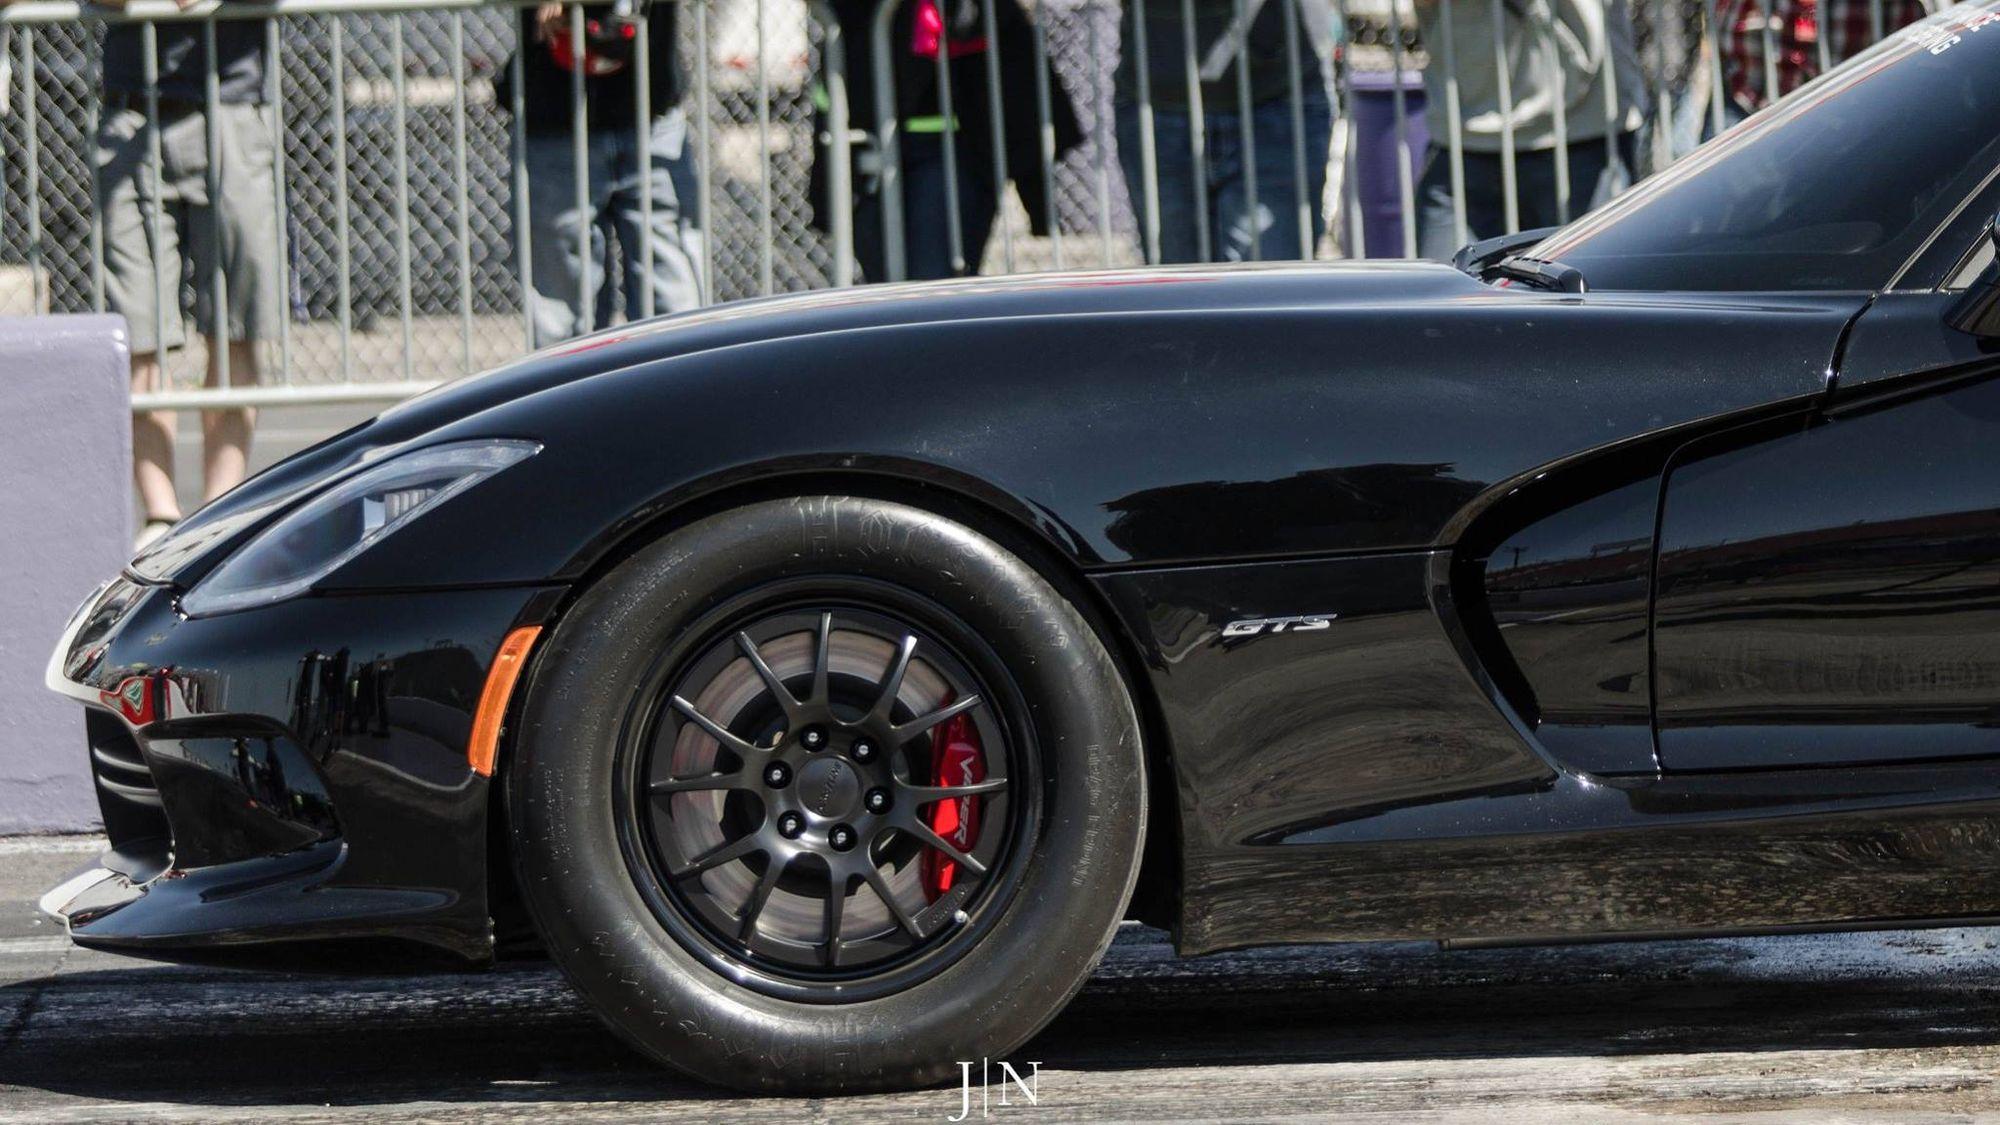 2013 Dodge Viper | D3 Performance Engineering World's Quickest Gen 5 Dodge Viper on Forgeline GA3-6 Six Lug Wheels - Wheel Shot